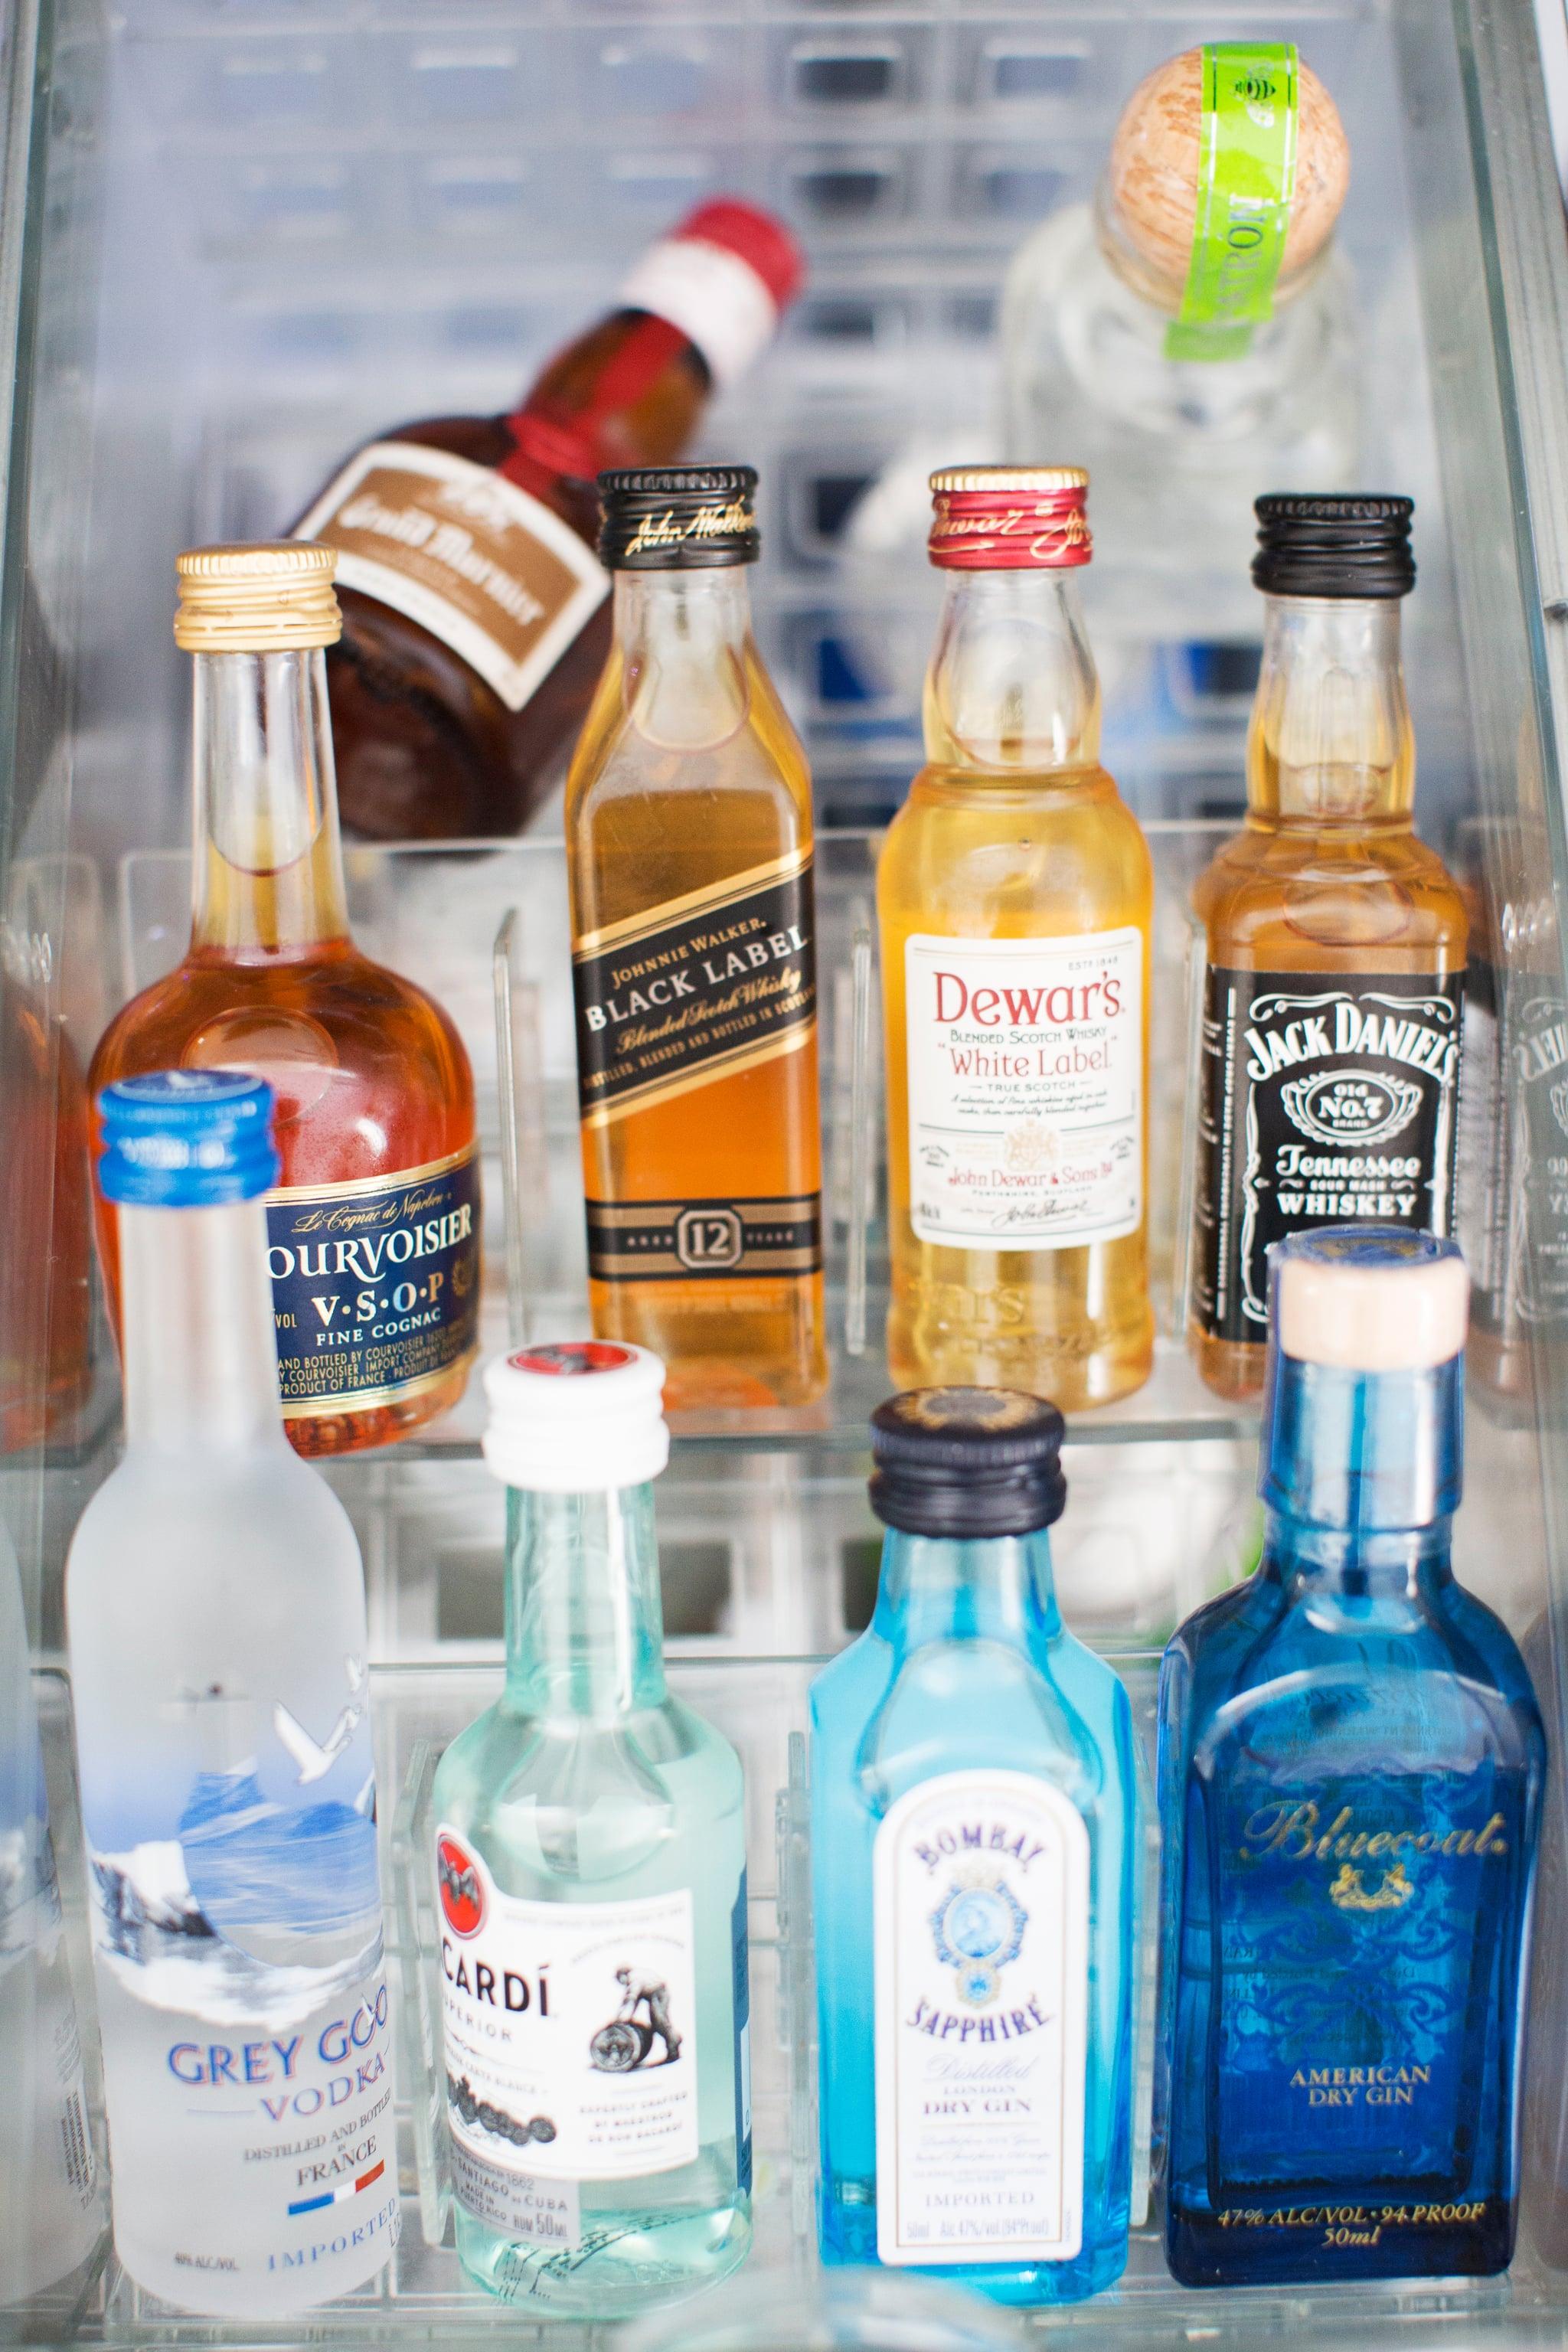 Lower Sugar Alcoholic Drinks